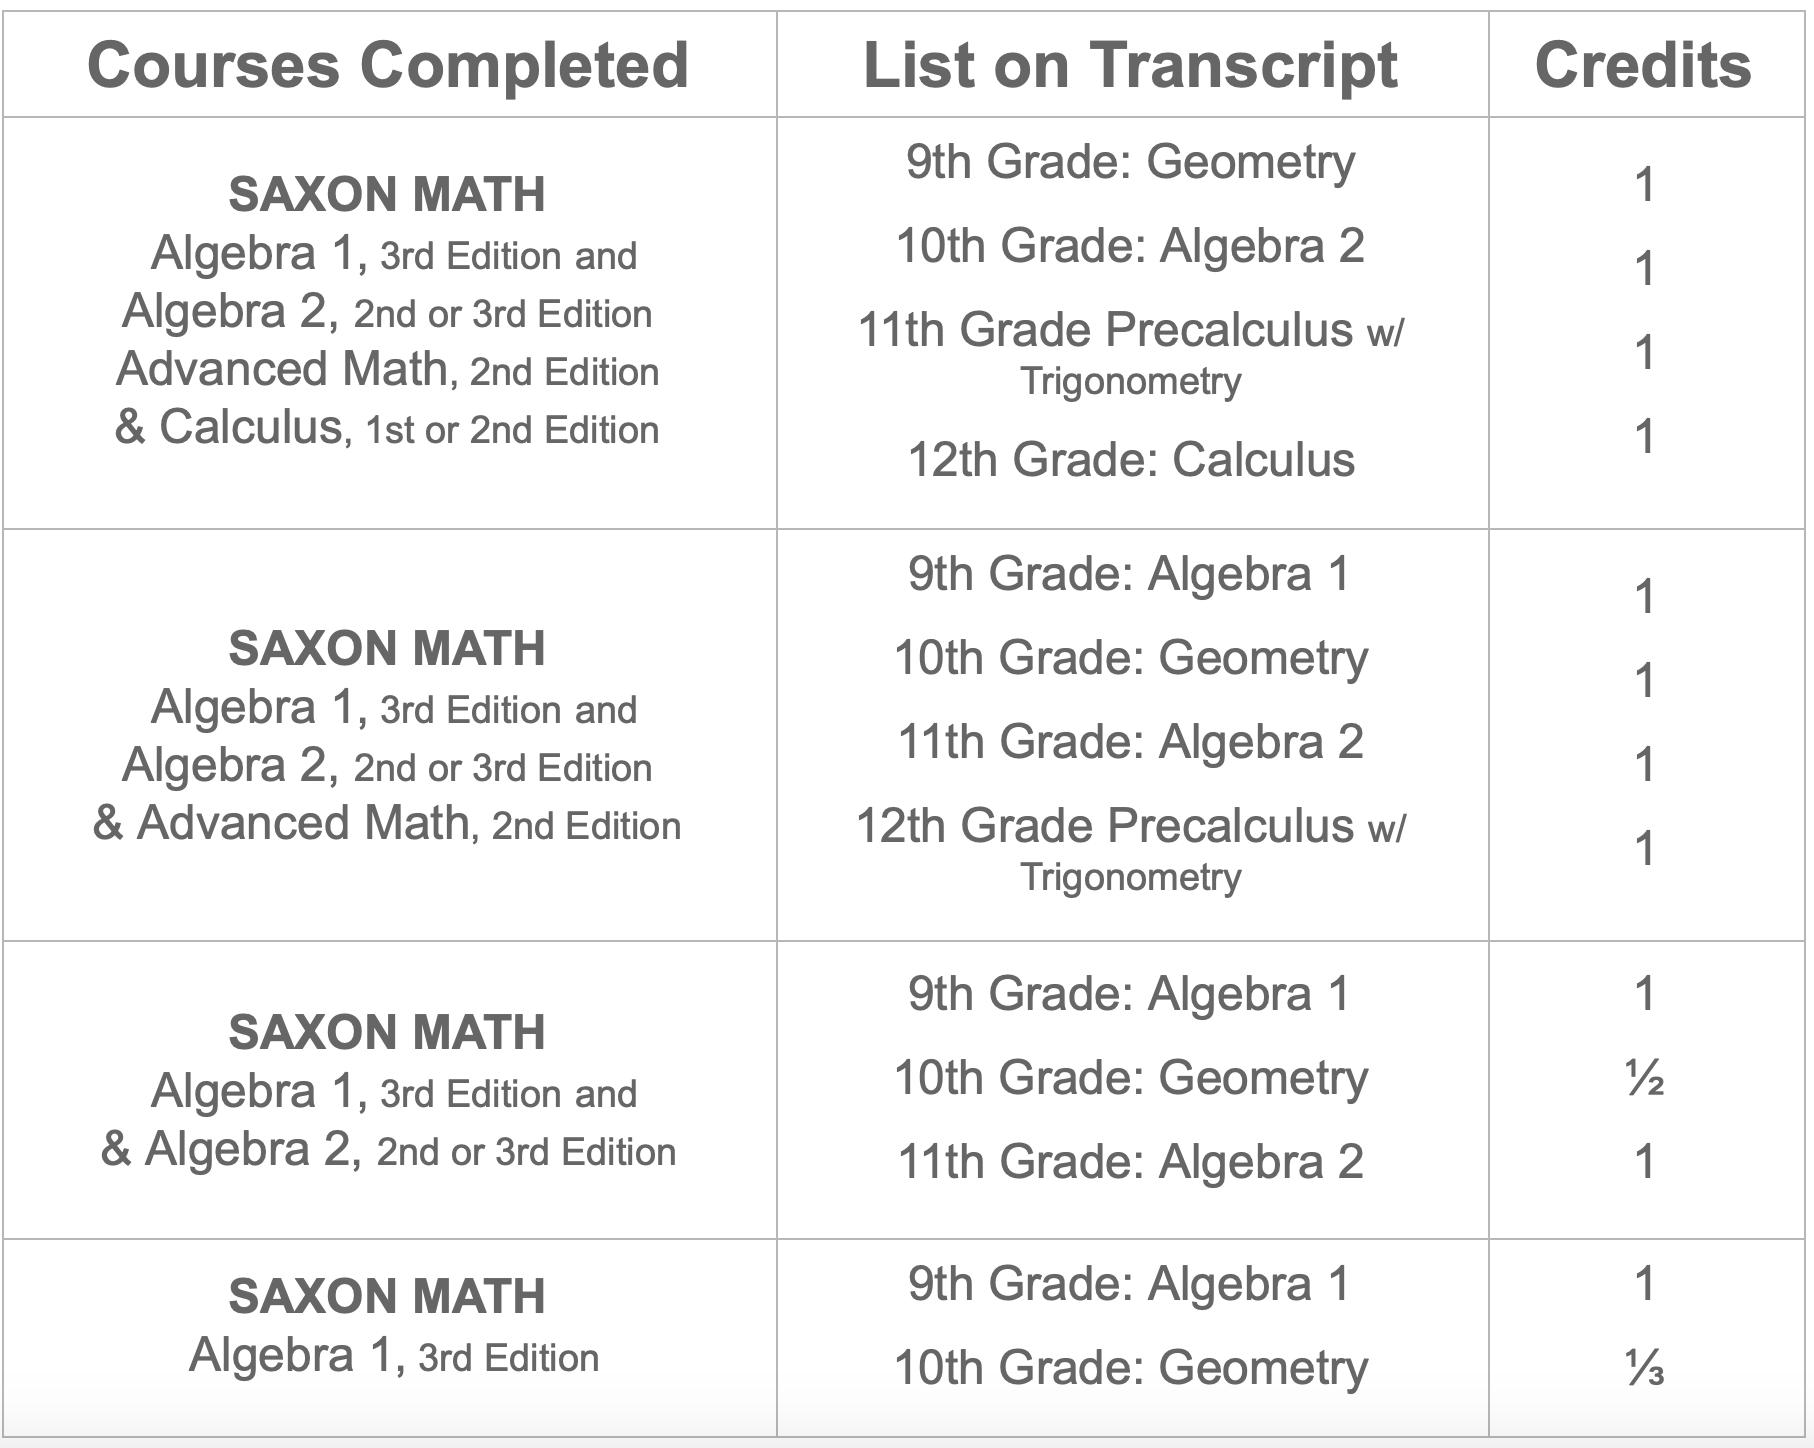 credits-standard-saxon-math-.png